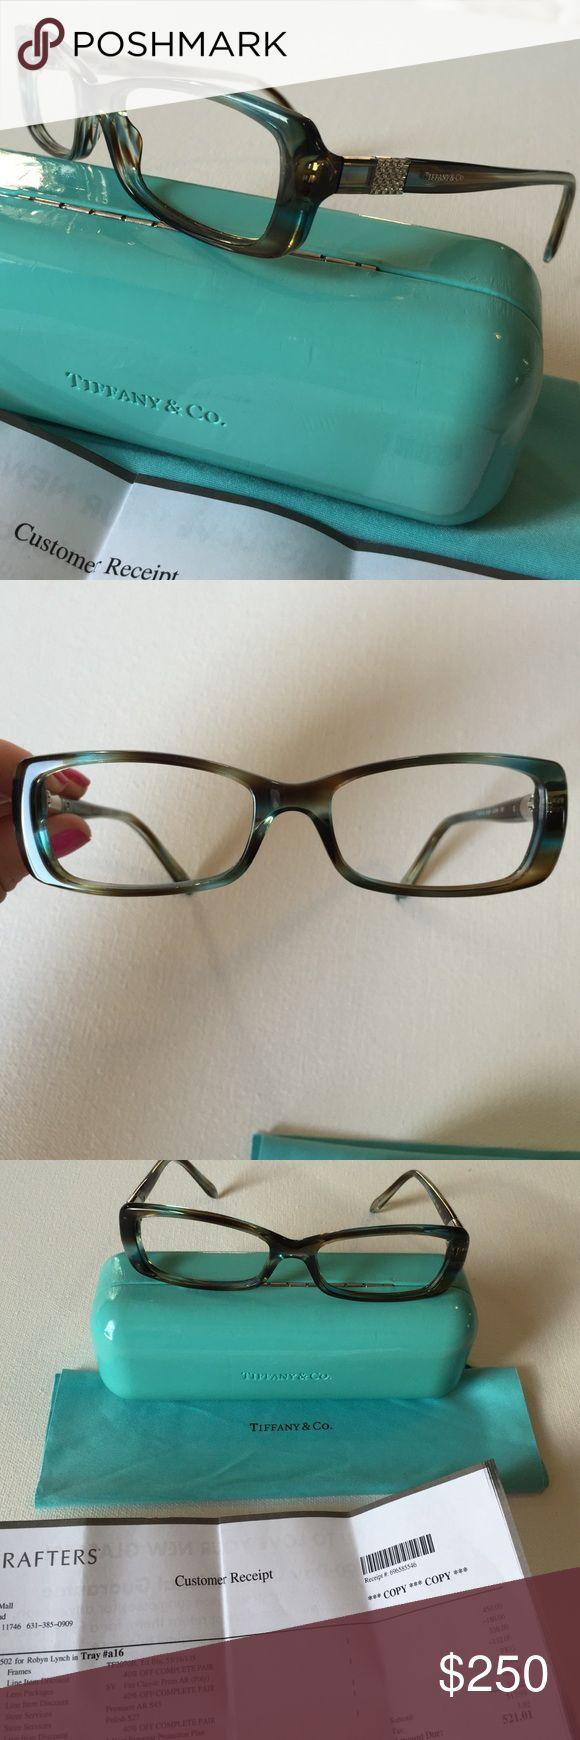 267 best Glasses / Sunglasses images on Pinterest | General eyewear ...